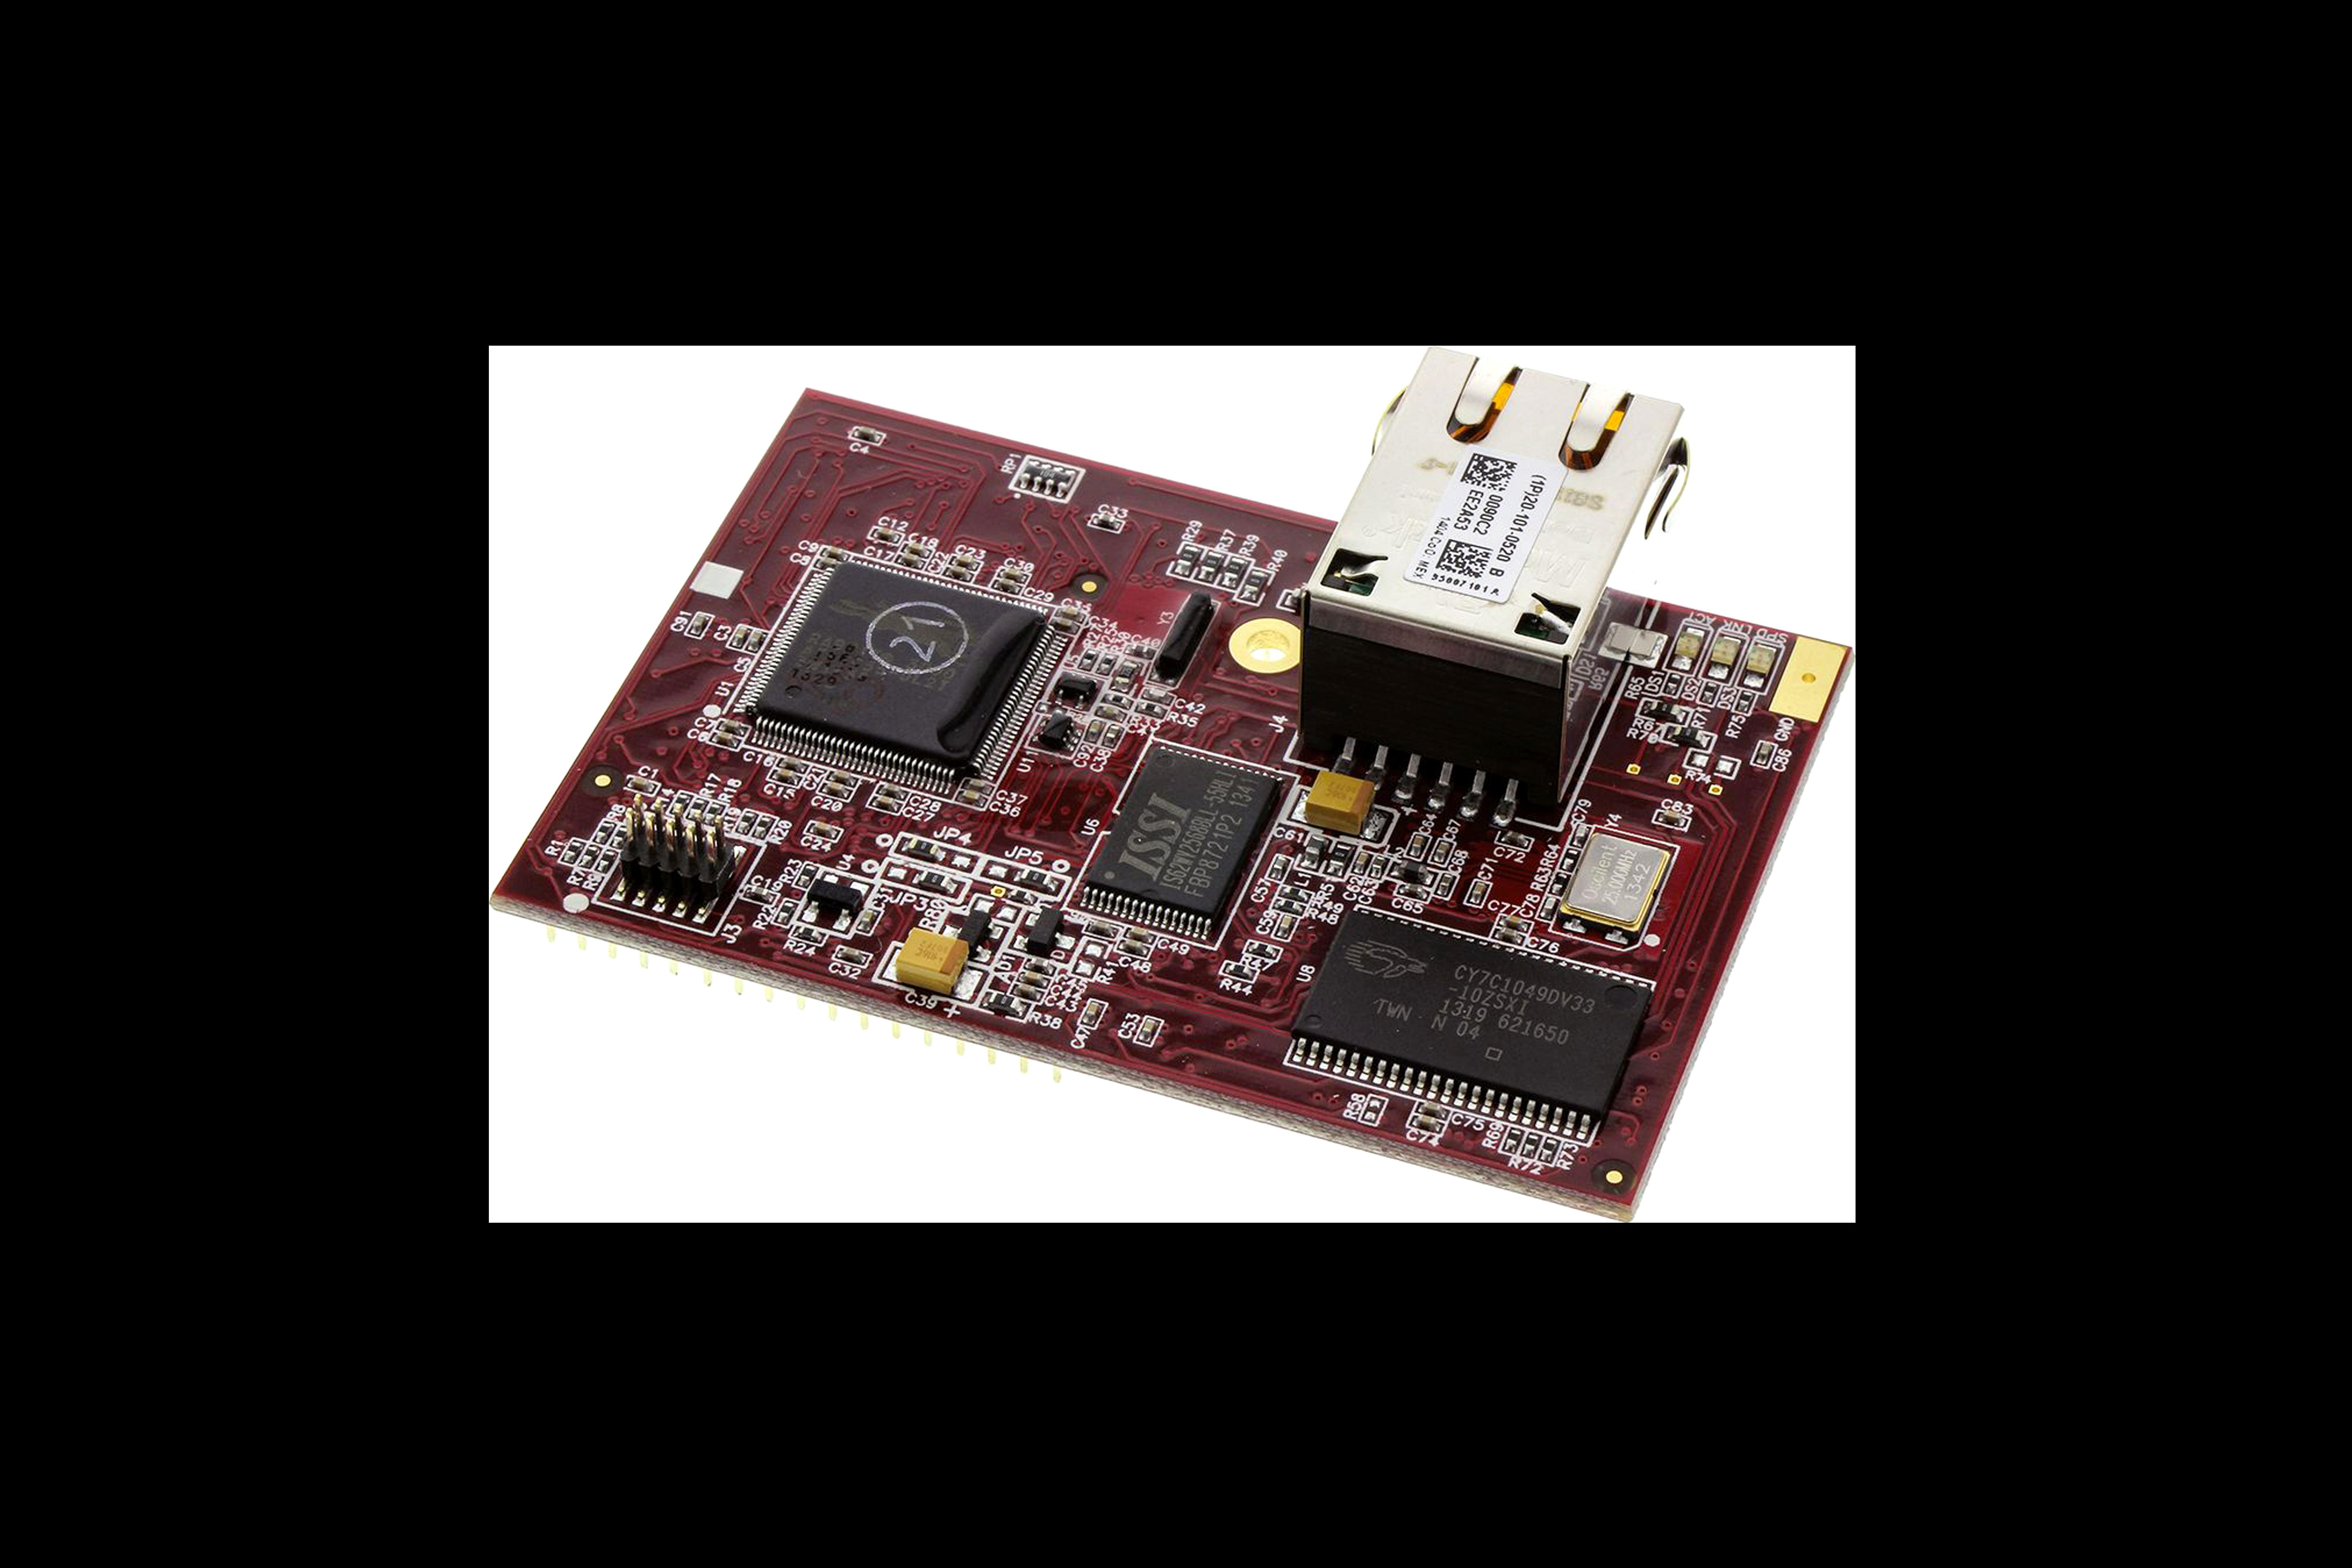 RCM3200 Core-module